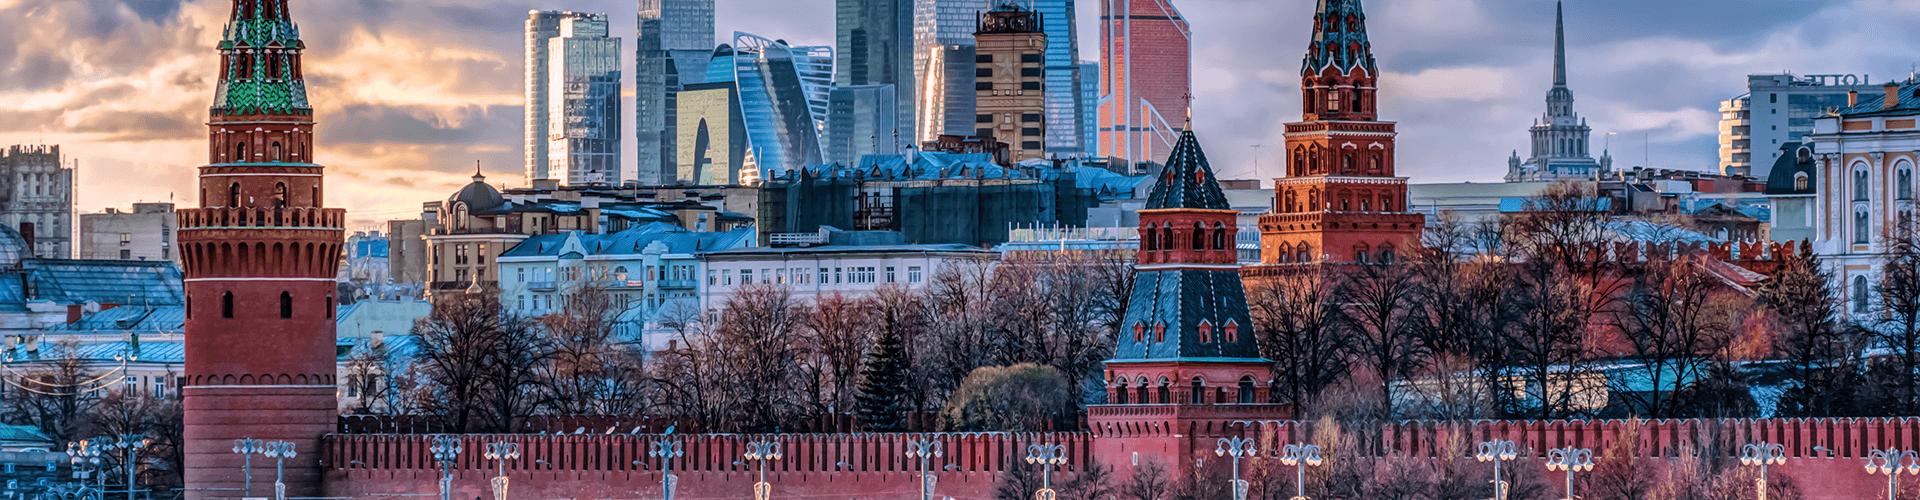 Moscow Domodedovo International